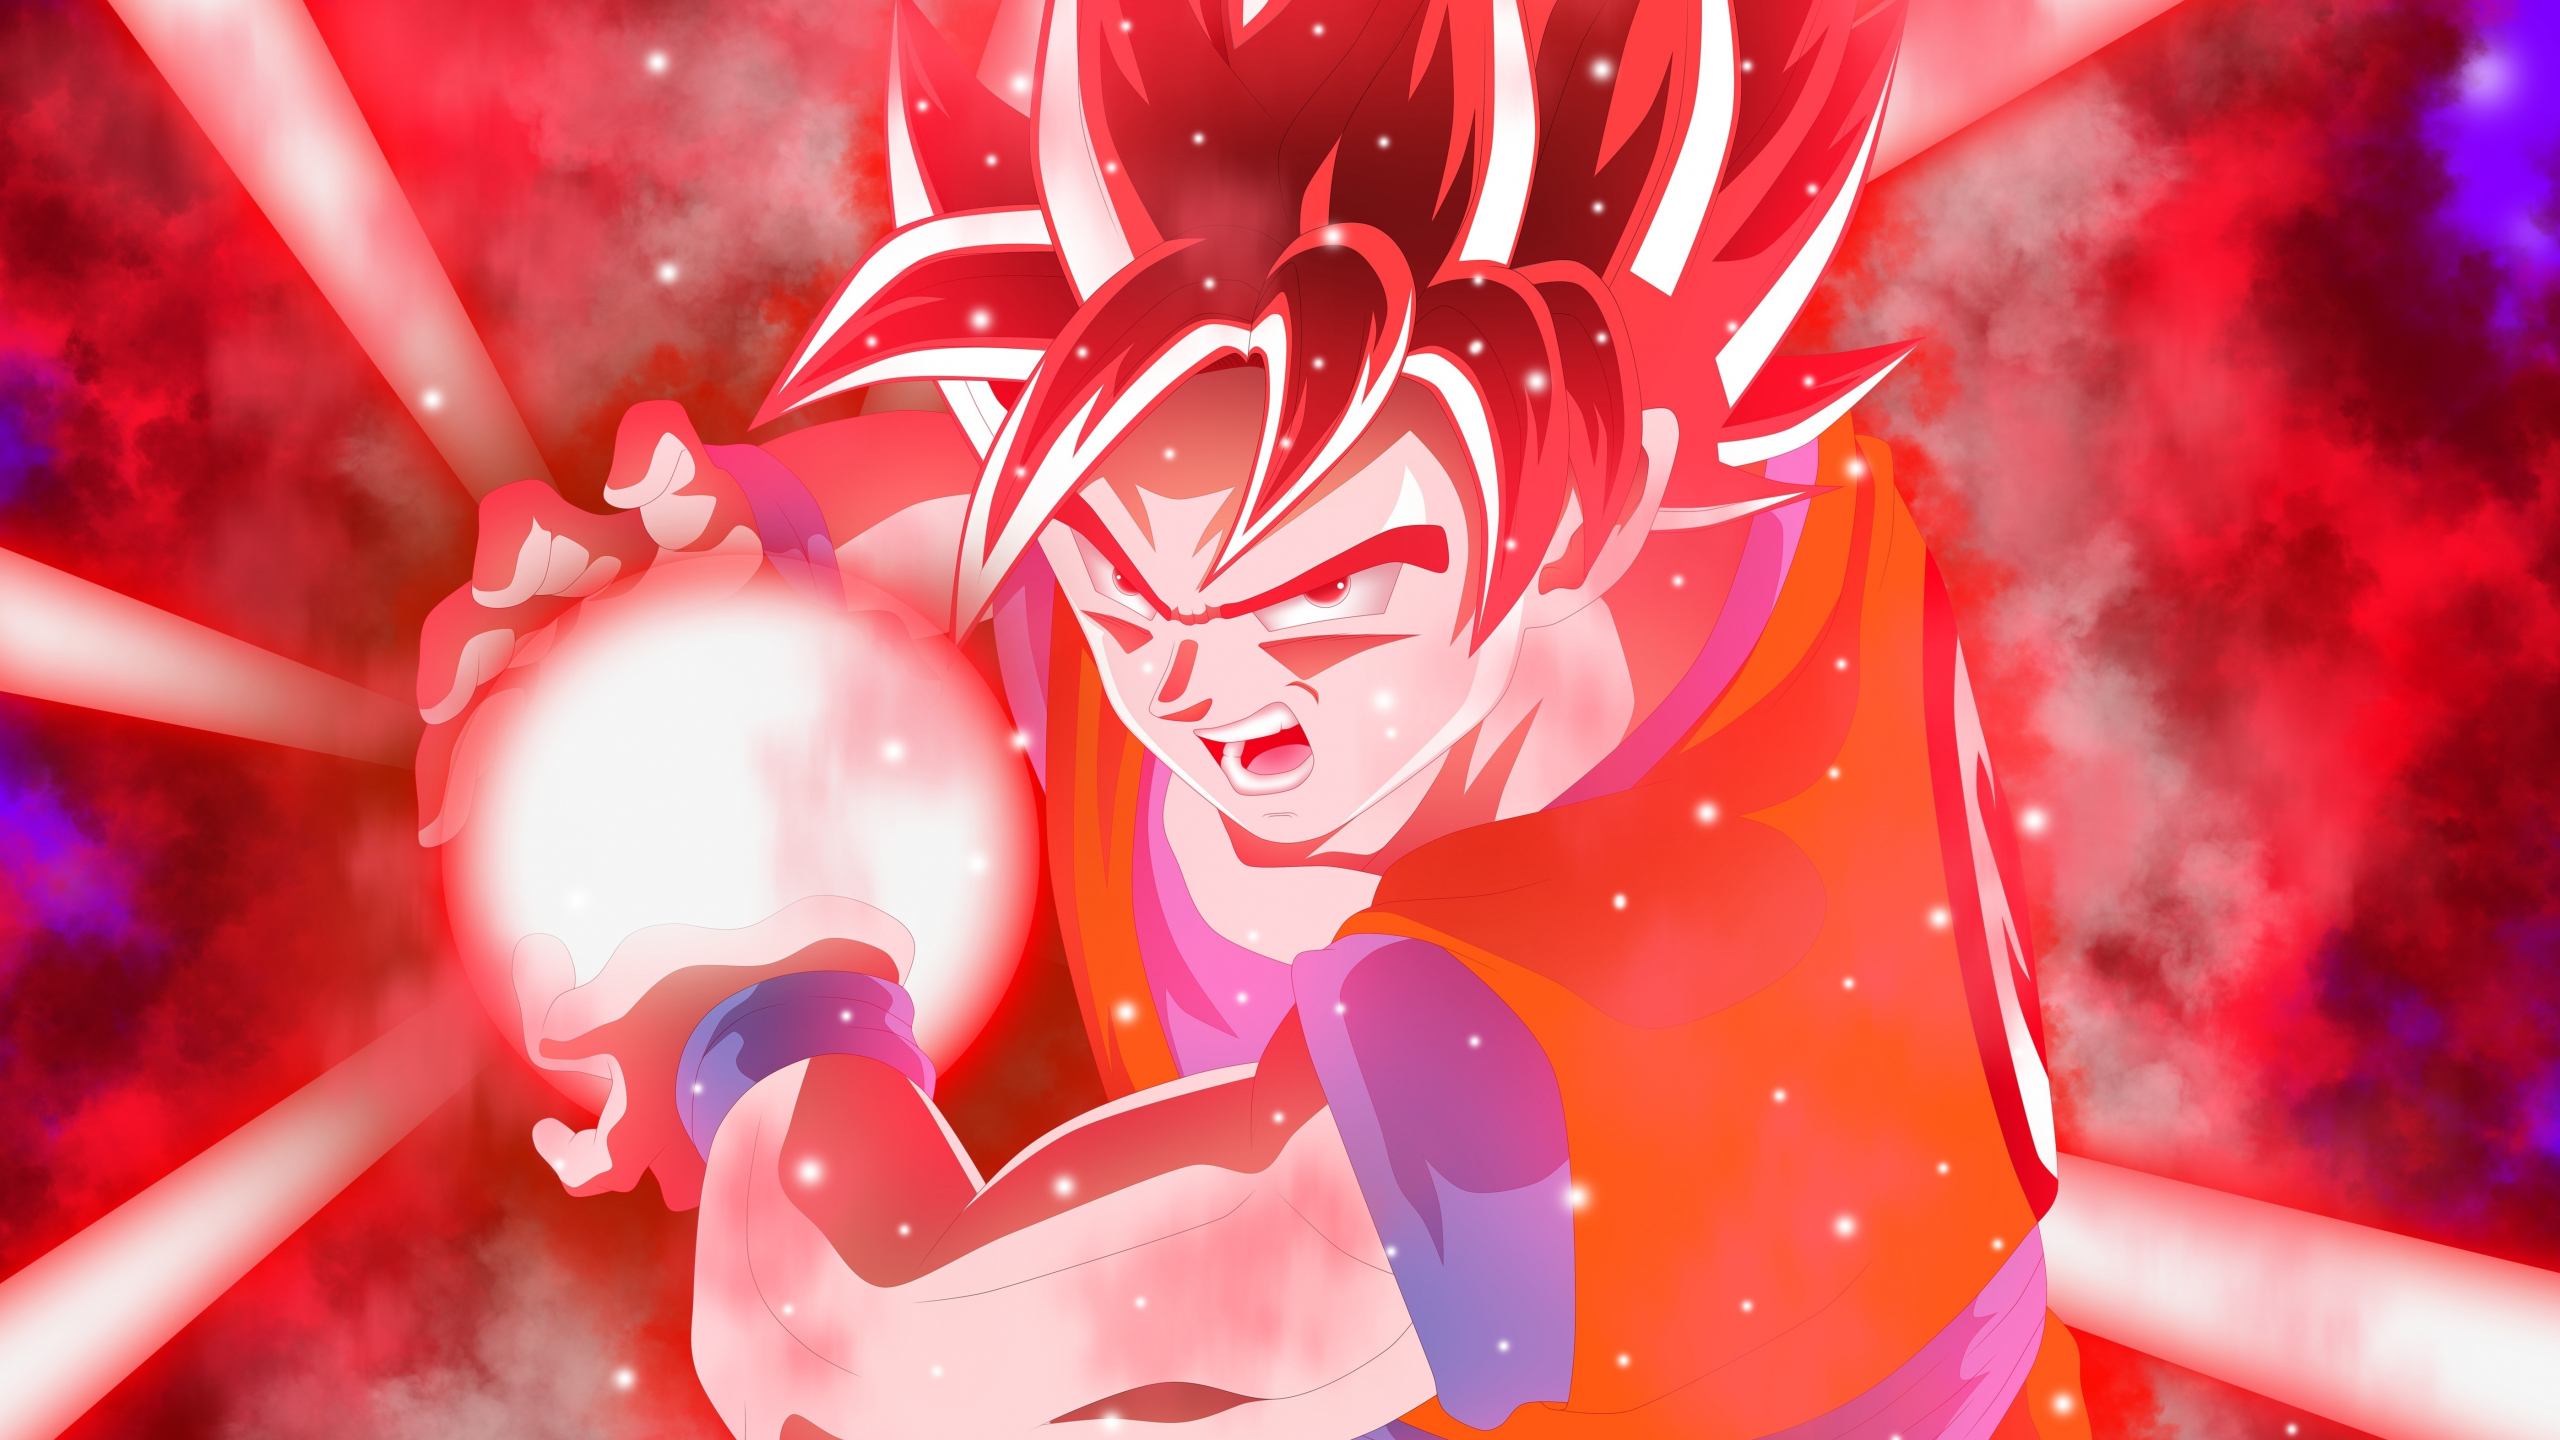 Download 2560x1440 Wallpaper Red Ultra Instinct Anime